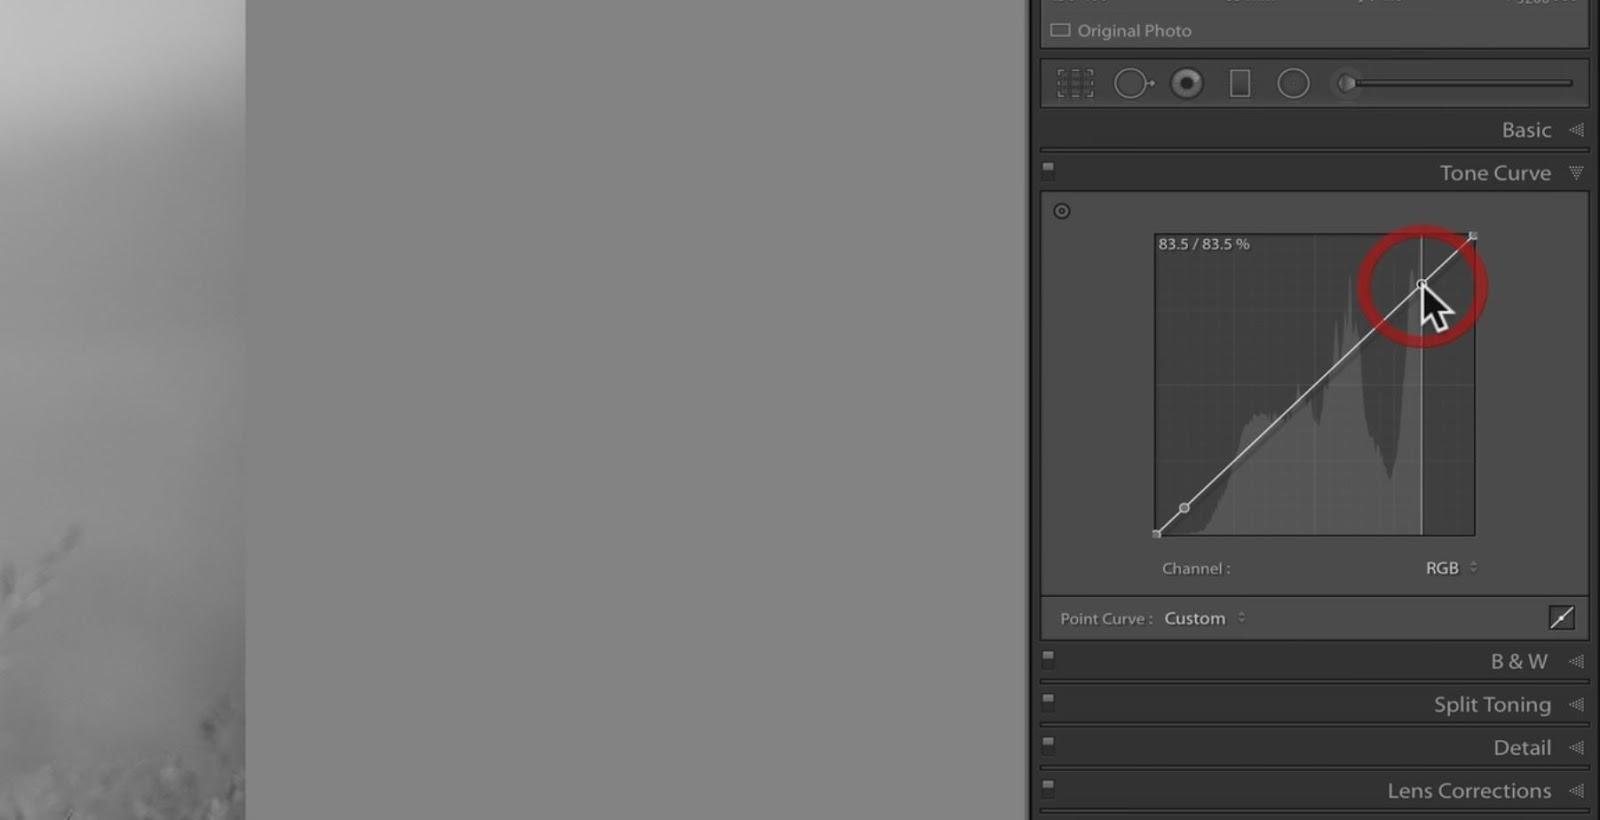 changing tones through curve